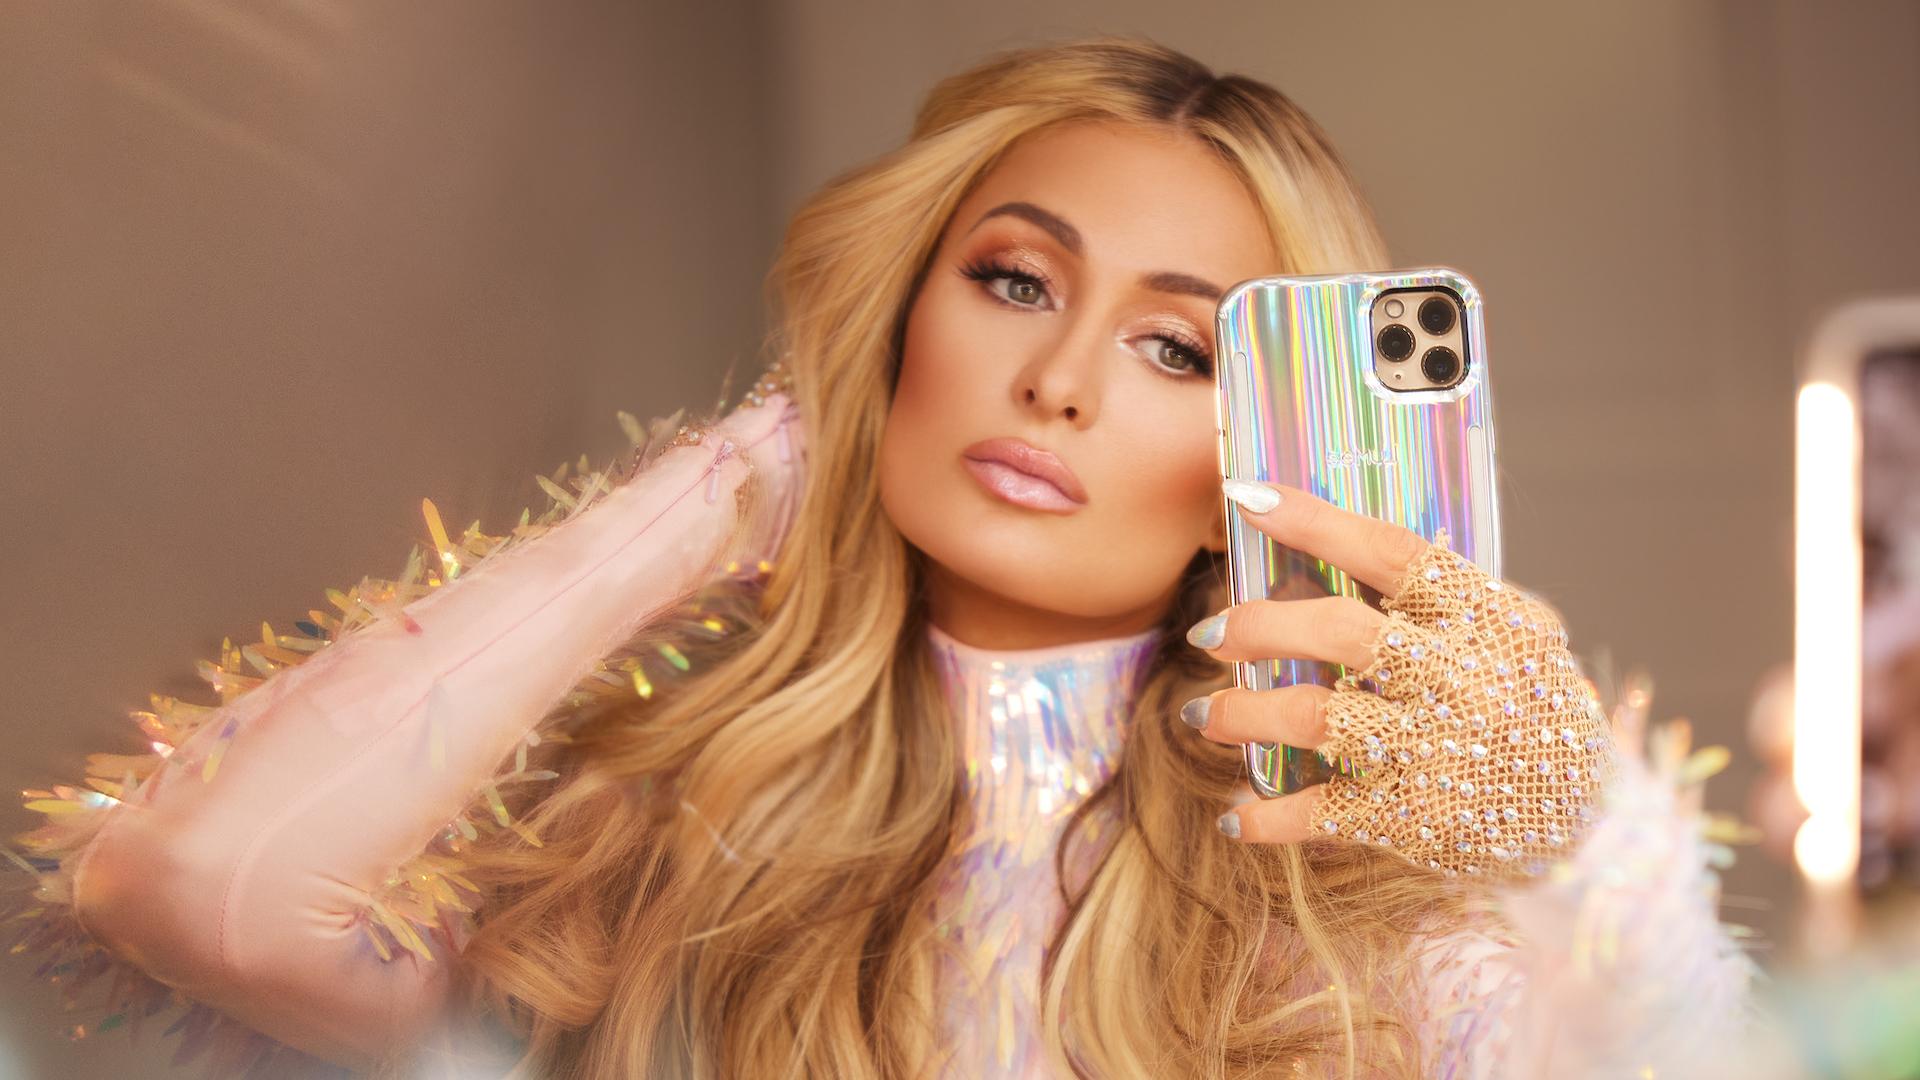 I'm Sliving For Paris Hilton's Holographic LuMee Phone Case Collab